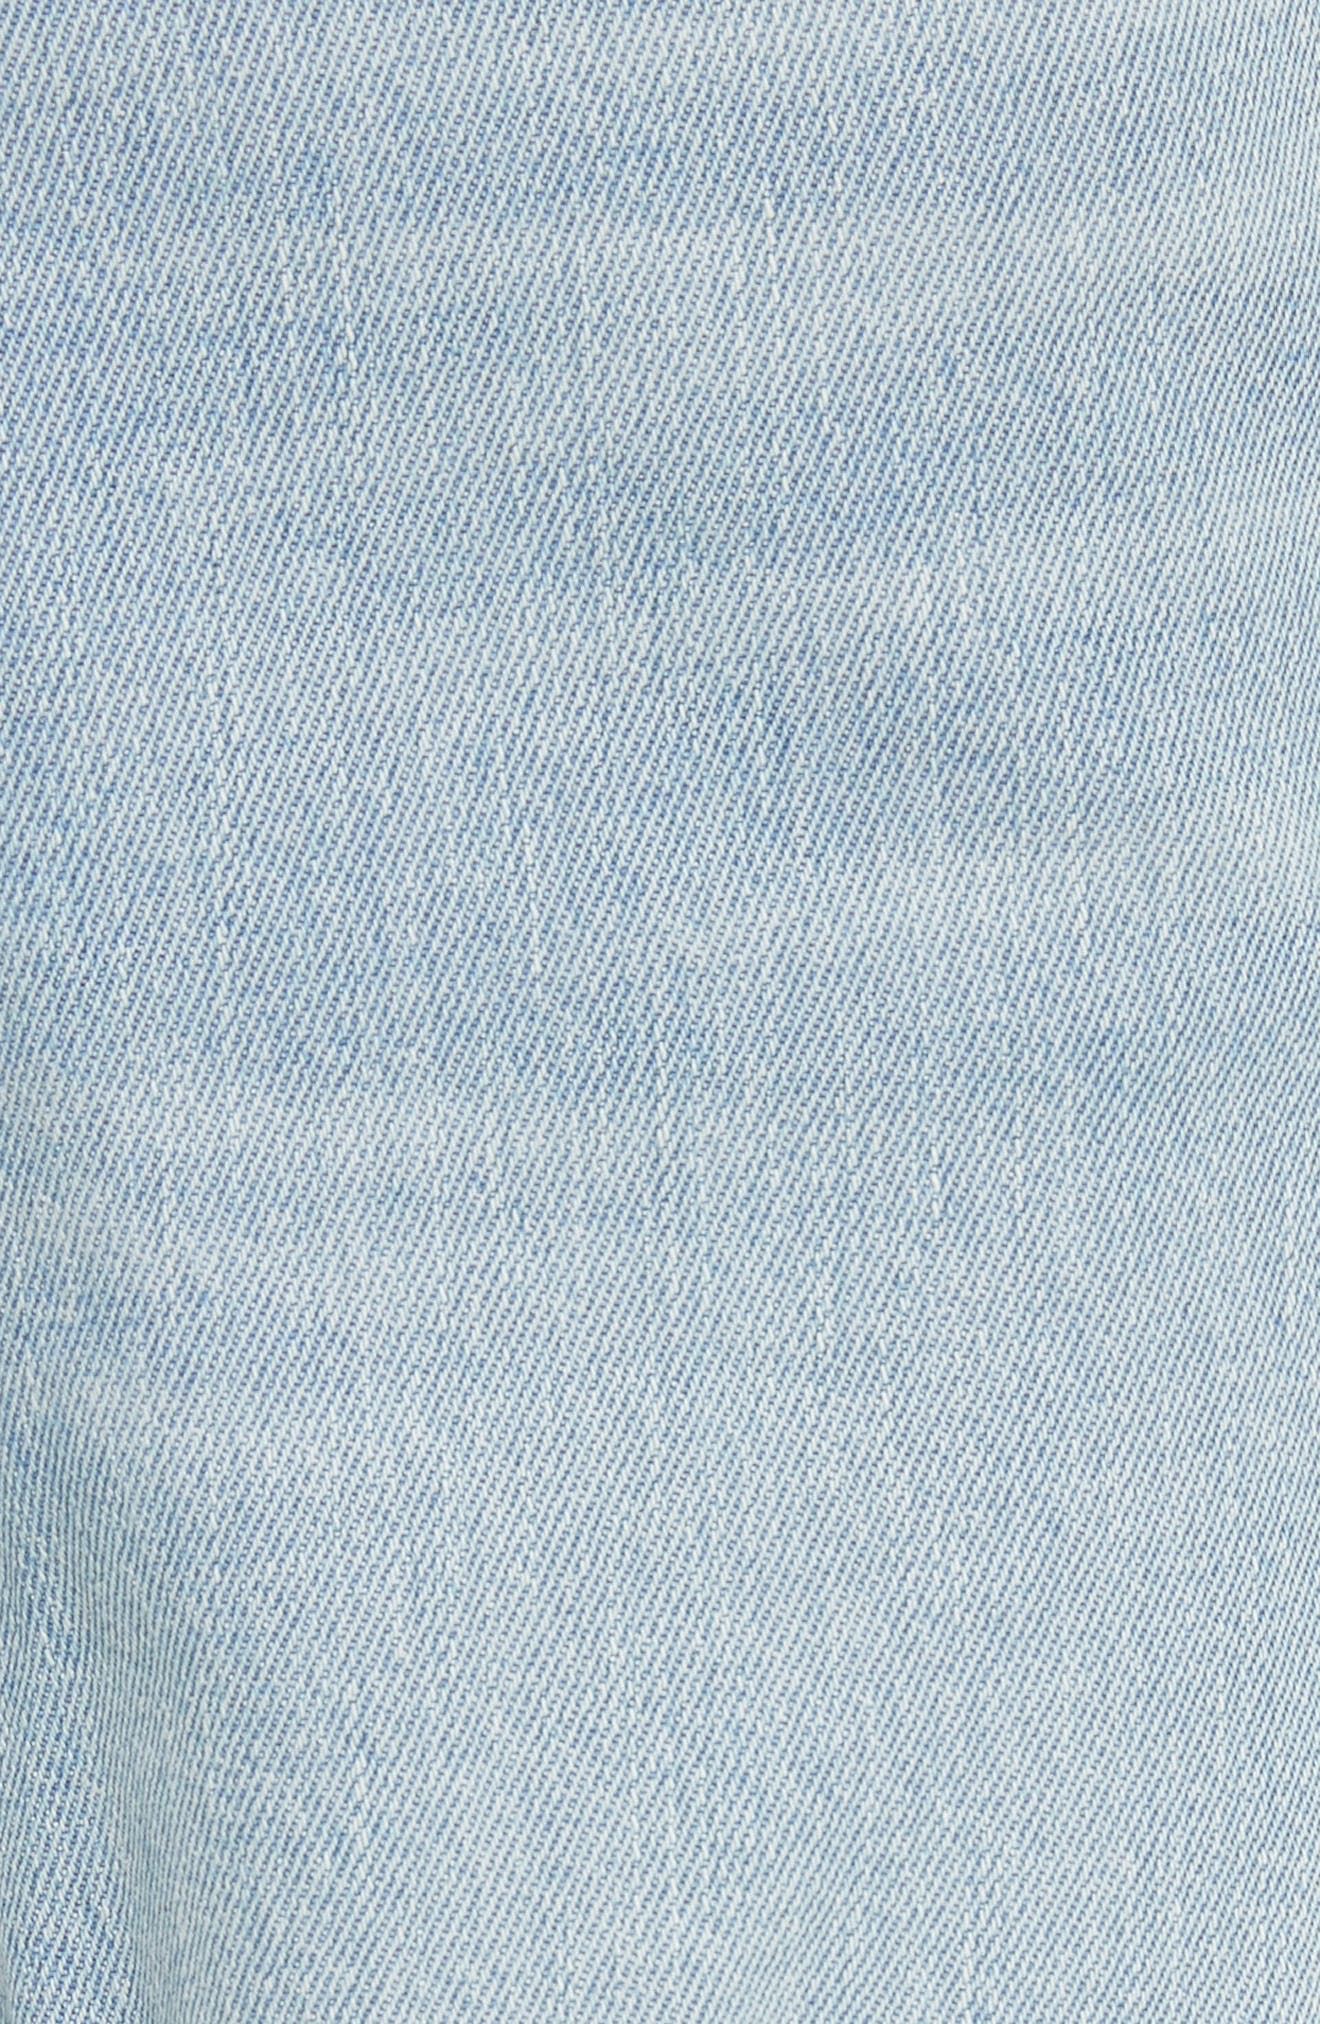 Alternate Image 6  - FRAME Le Original Raw Edge High Waist Jeans (Harrah)